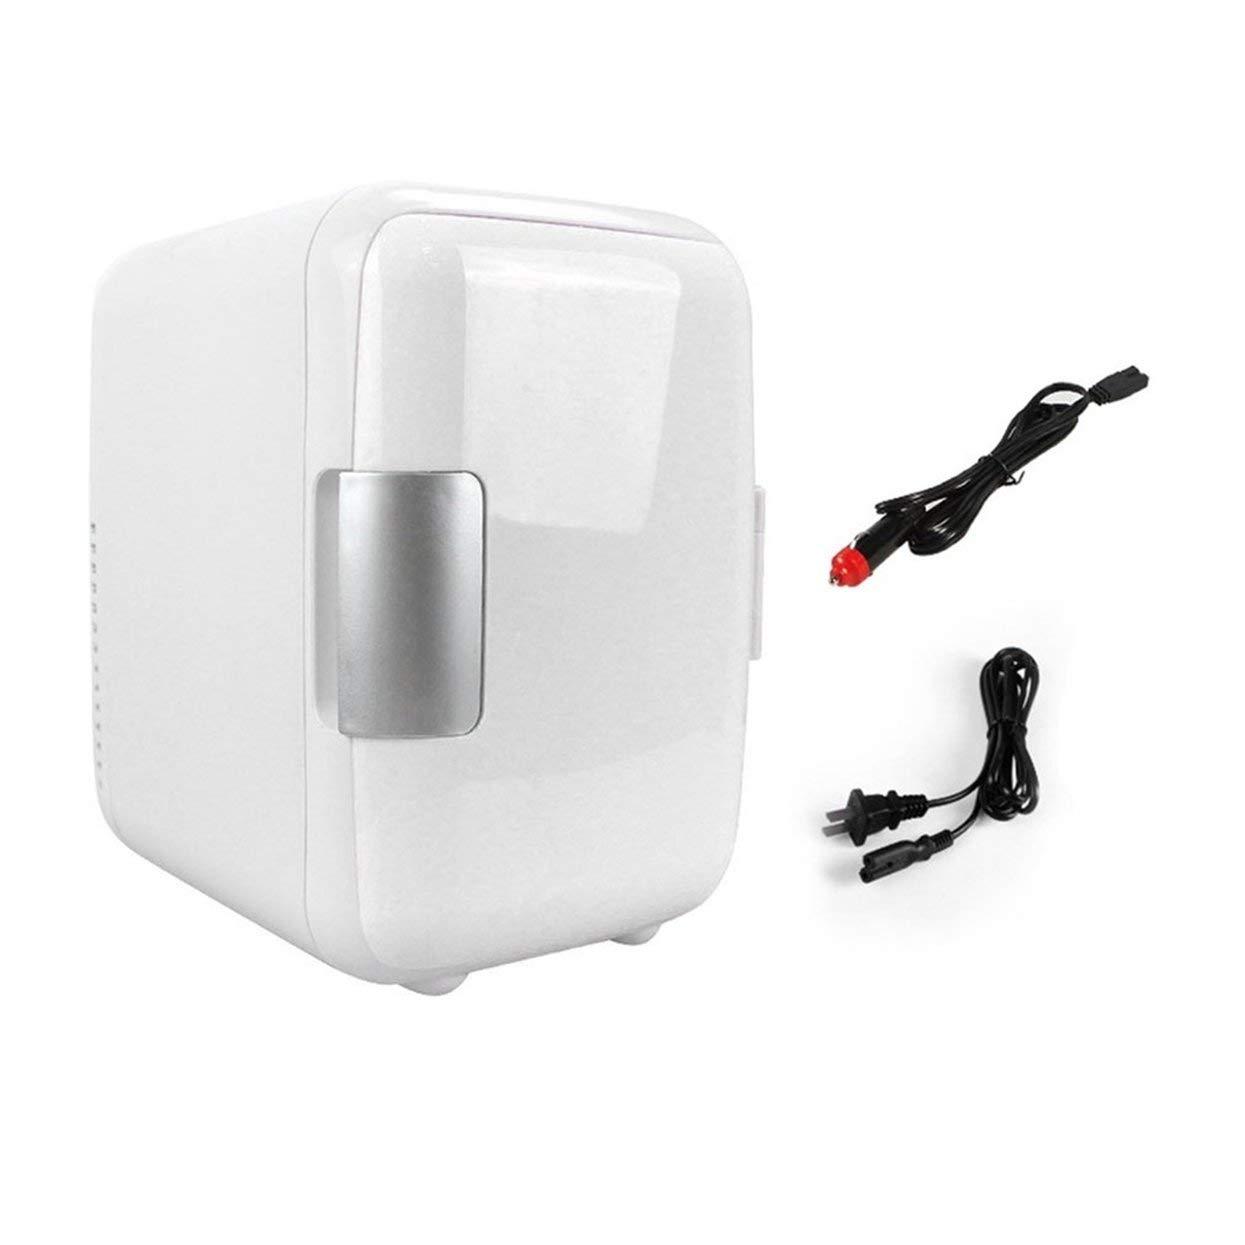 anyilon Dual-Use 4L Home Car Use Refrigerators Ultra Quiet Low Noise Car Mini Refrigerators Freezer Cooling Heating Box Fridge by anyilon (Image #1)